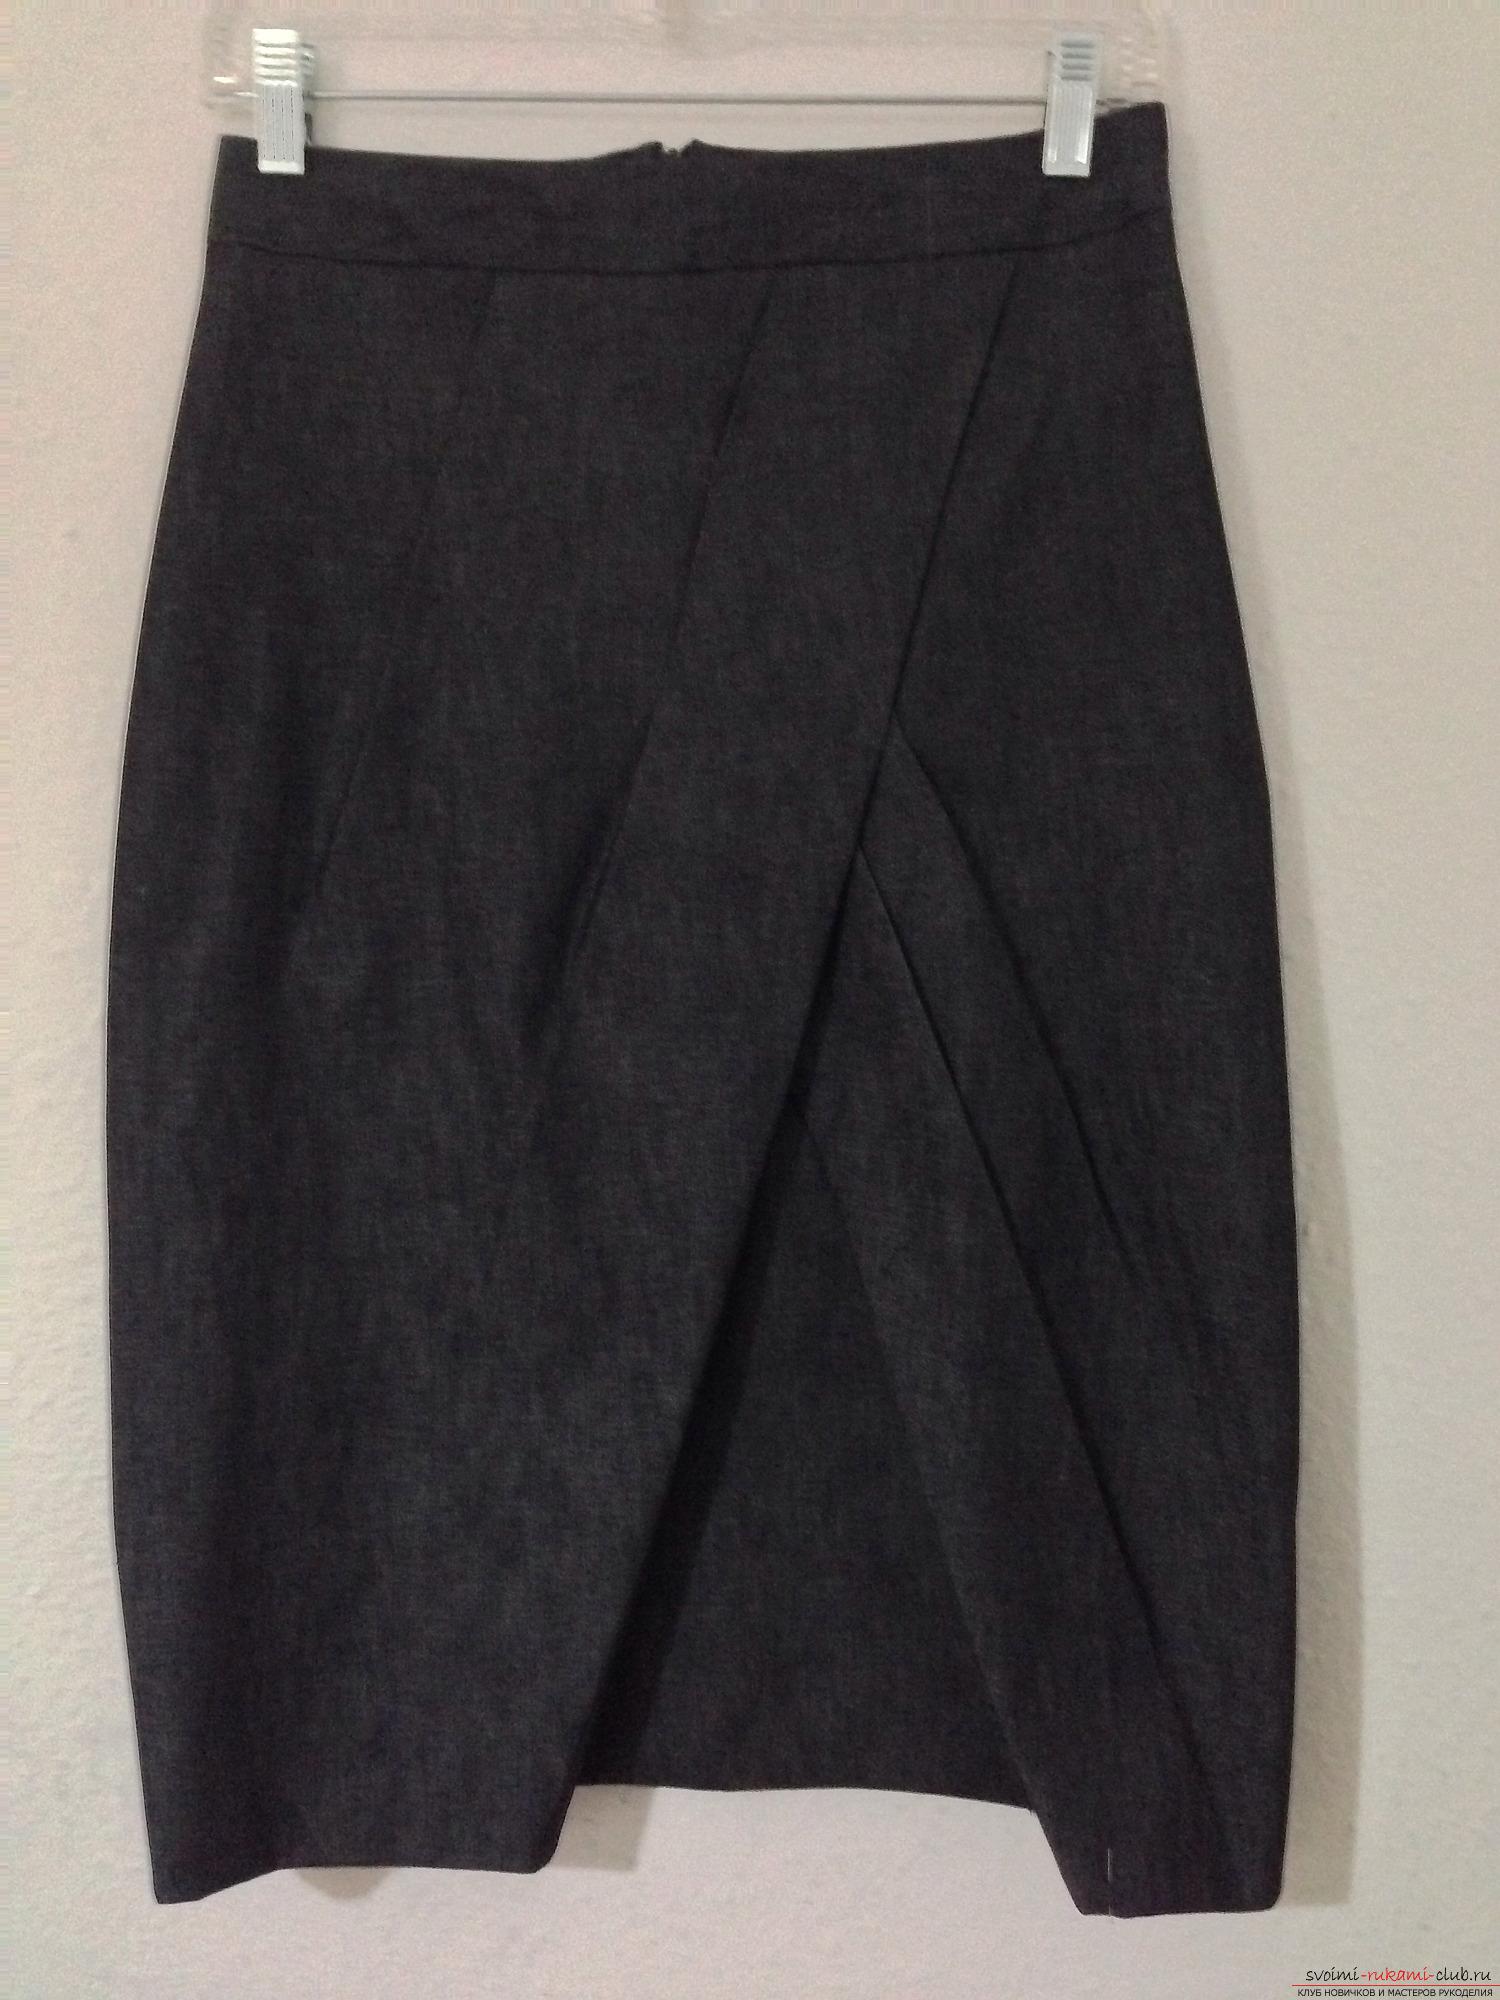 Выкройка юбки-тюльпан от Анастасии Корфиати 3